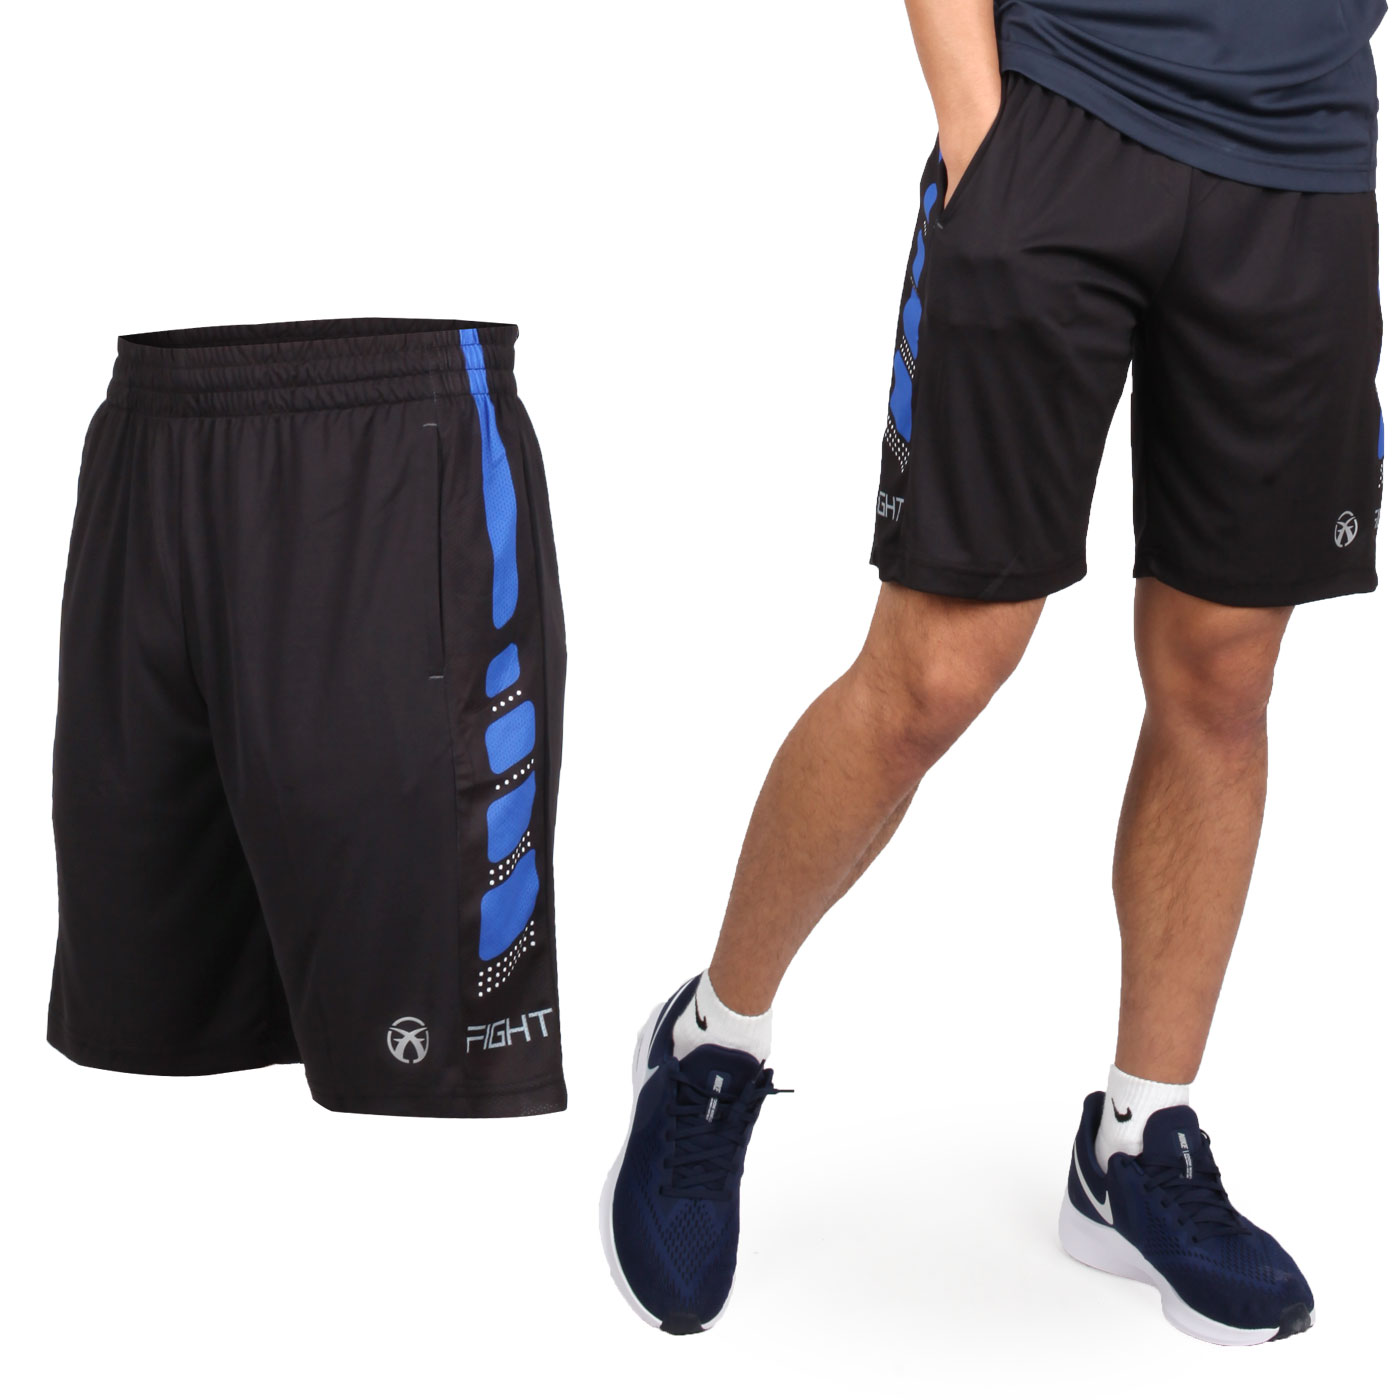 FIRESTAR 男款吸濕排汗籃球短褲 B9201-18 - 黑藍